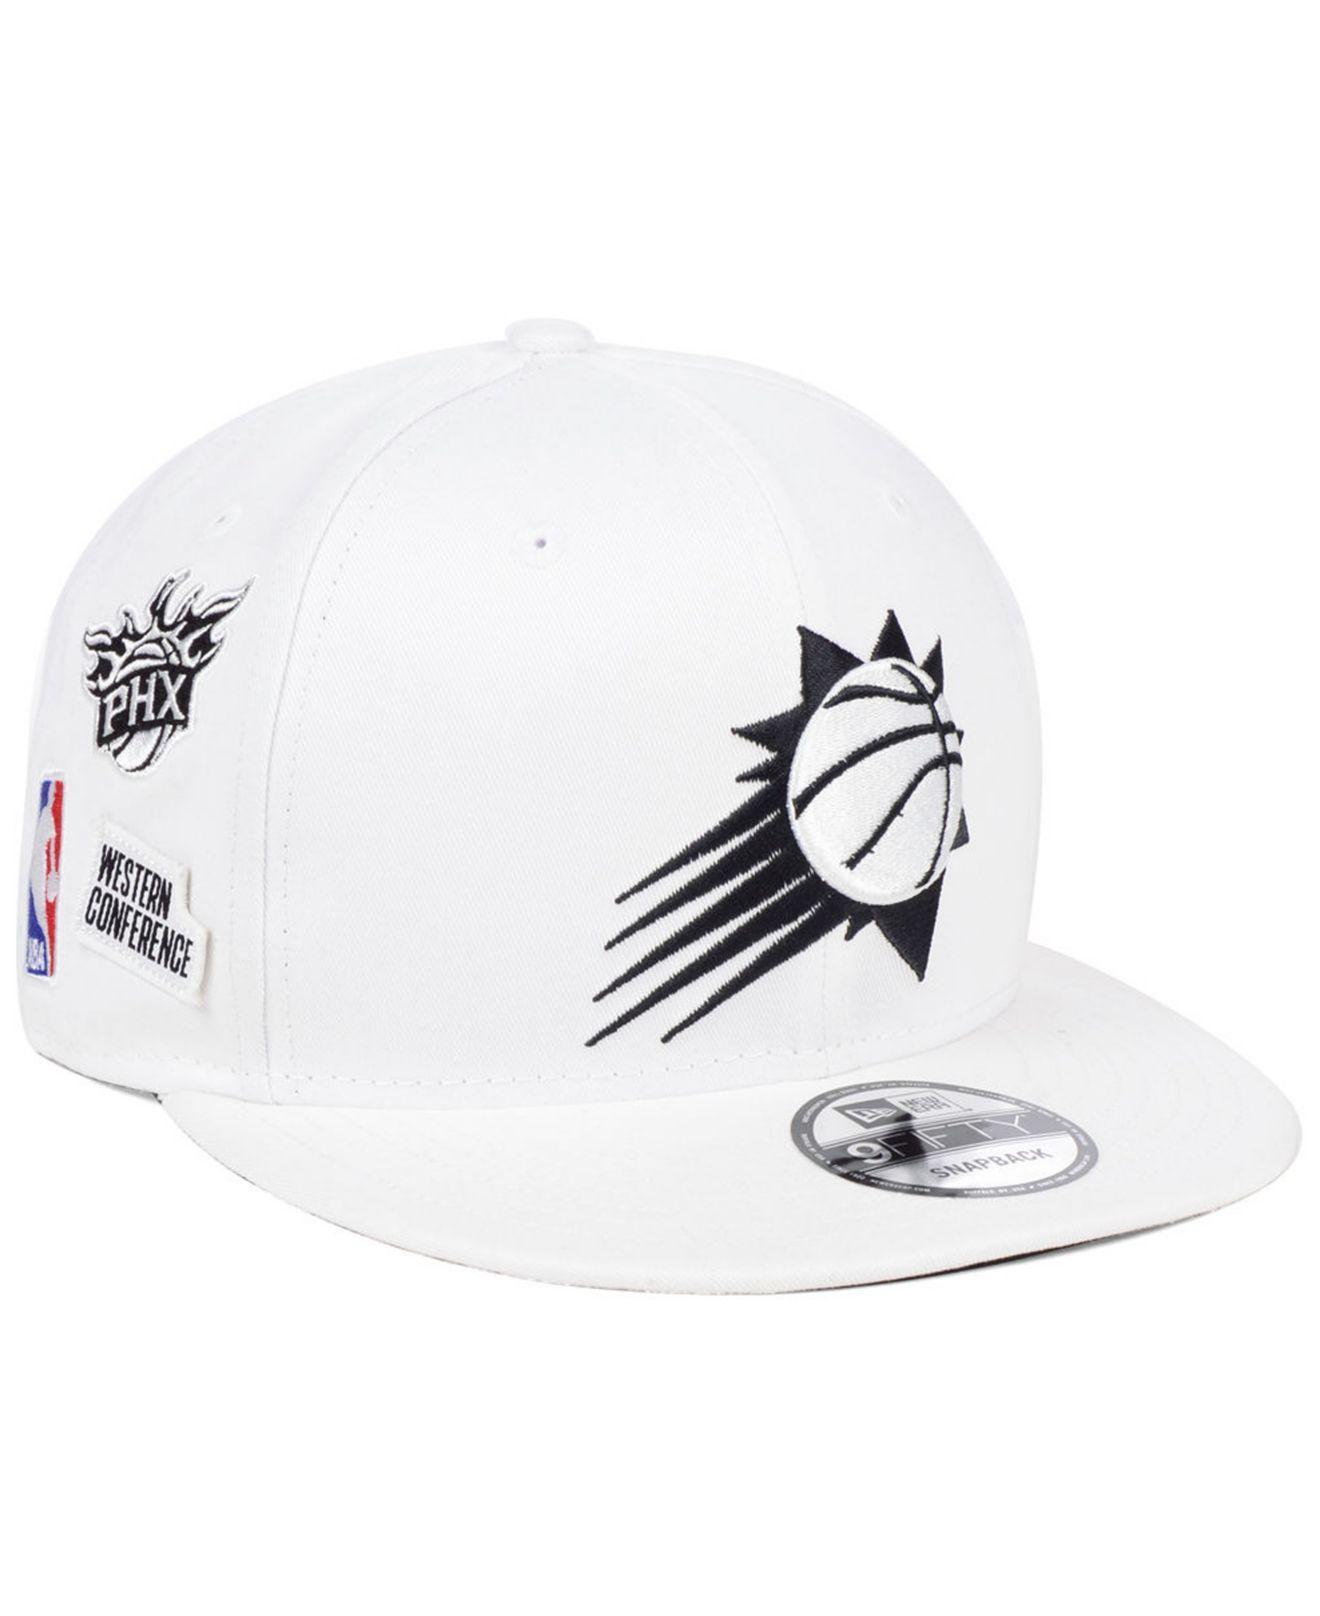 the latest 95b89 21a78 ... uk ktz white phoenix suns night sky 9fifty snapback cap for men lyst.  view fullscreen